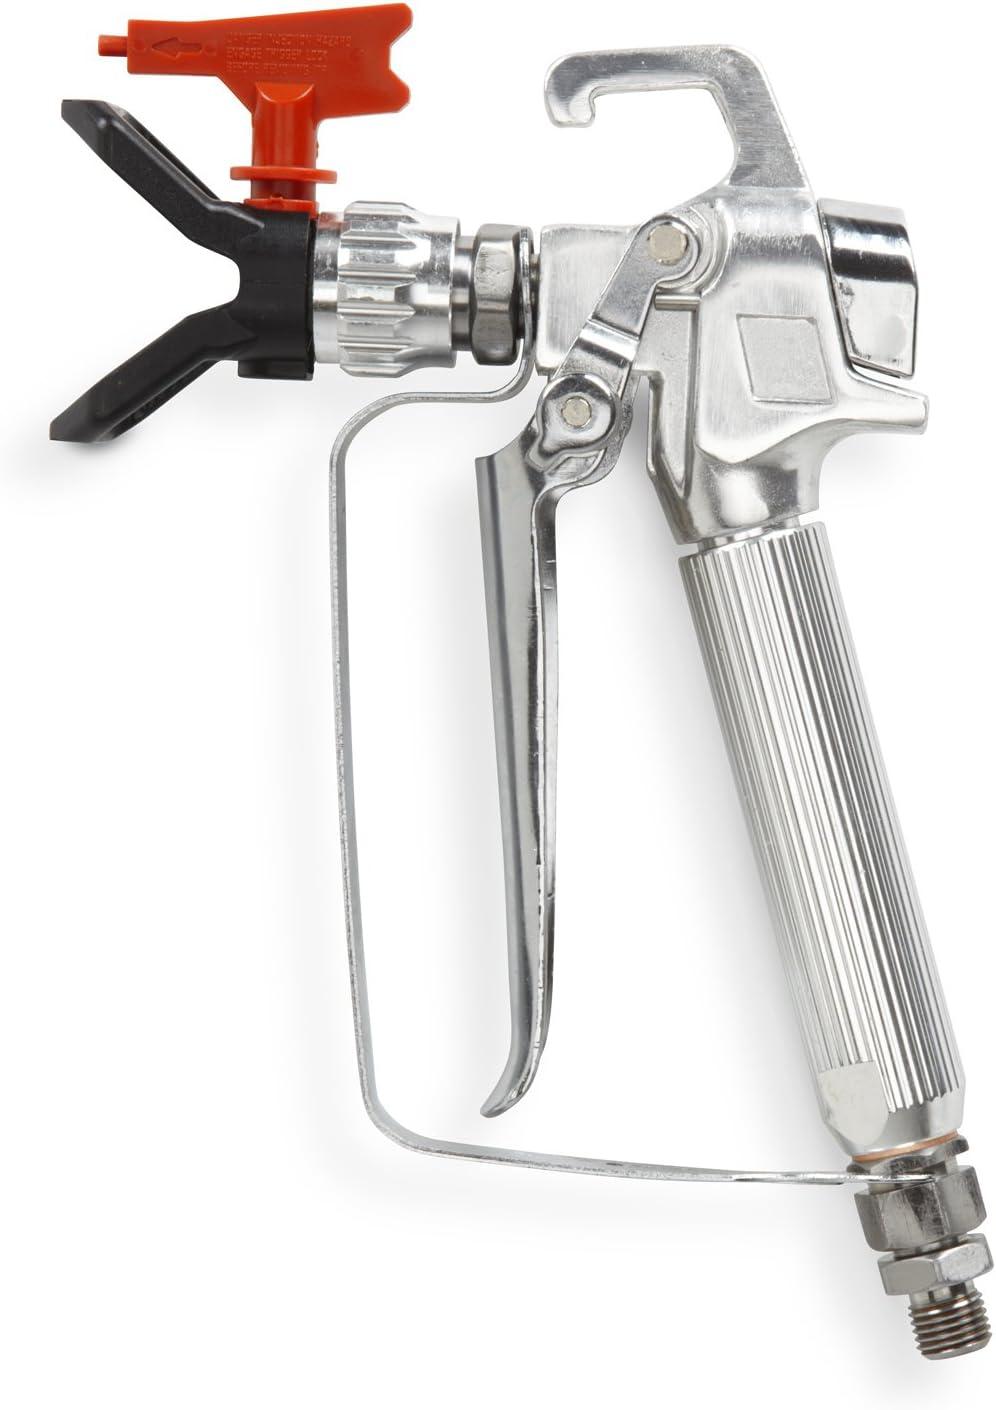 HomeRight C800863 Power-Flo Pro 2800 Paint Sprayer Spray Gun, Silver